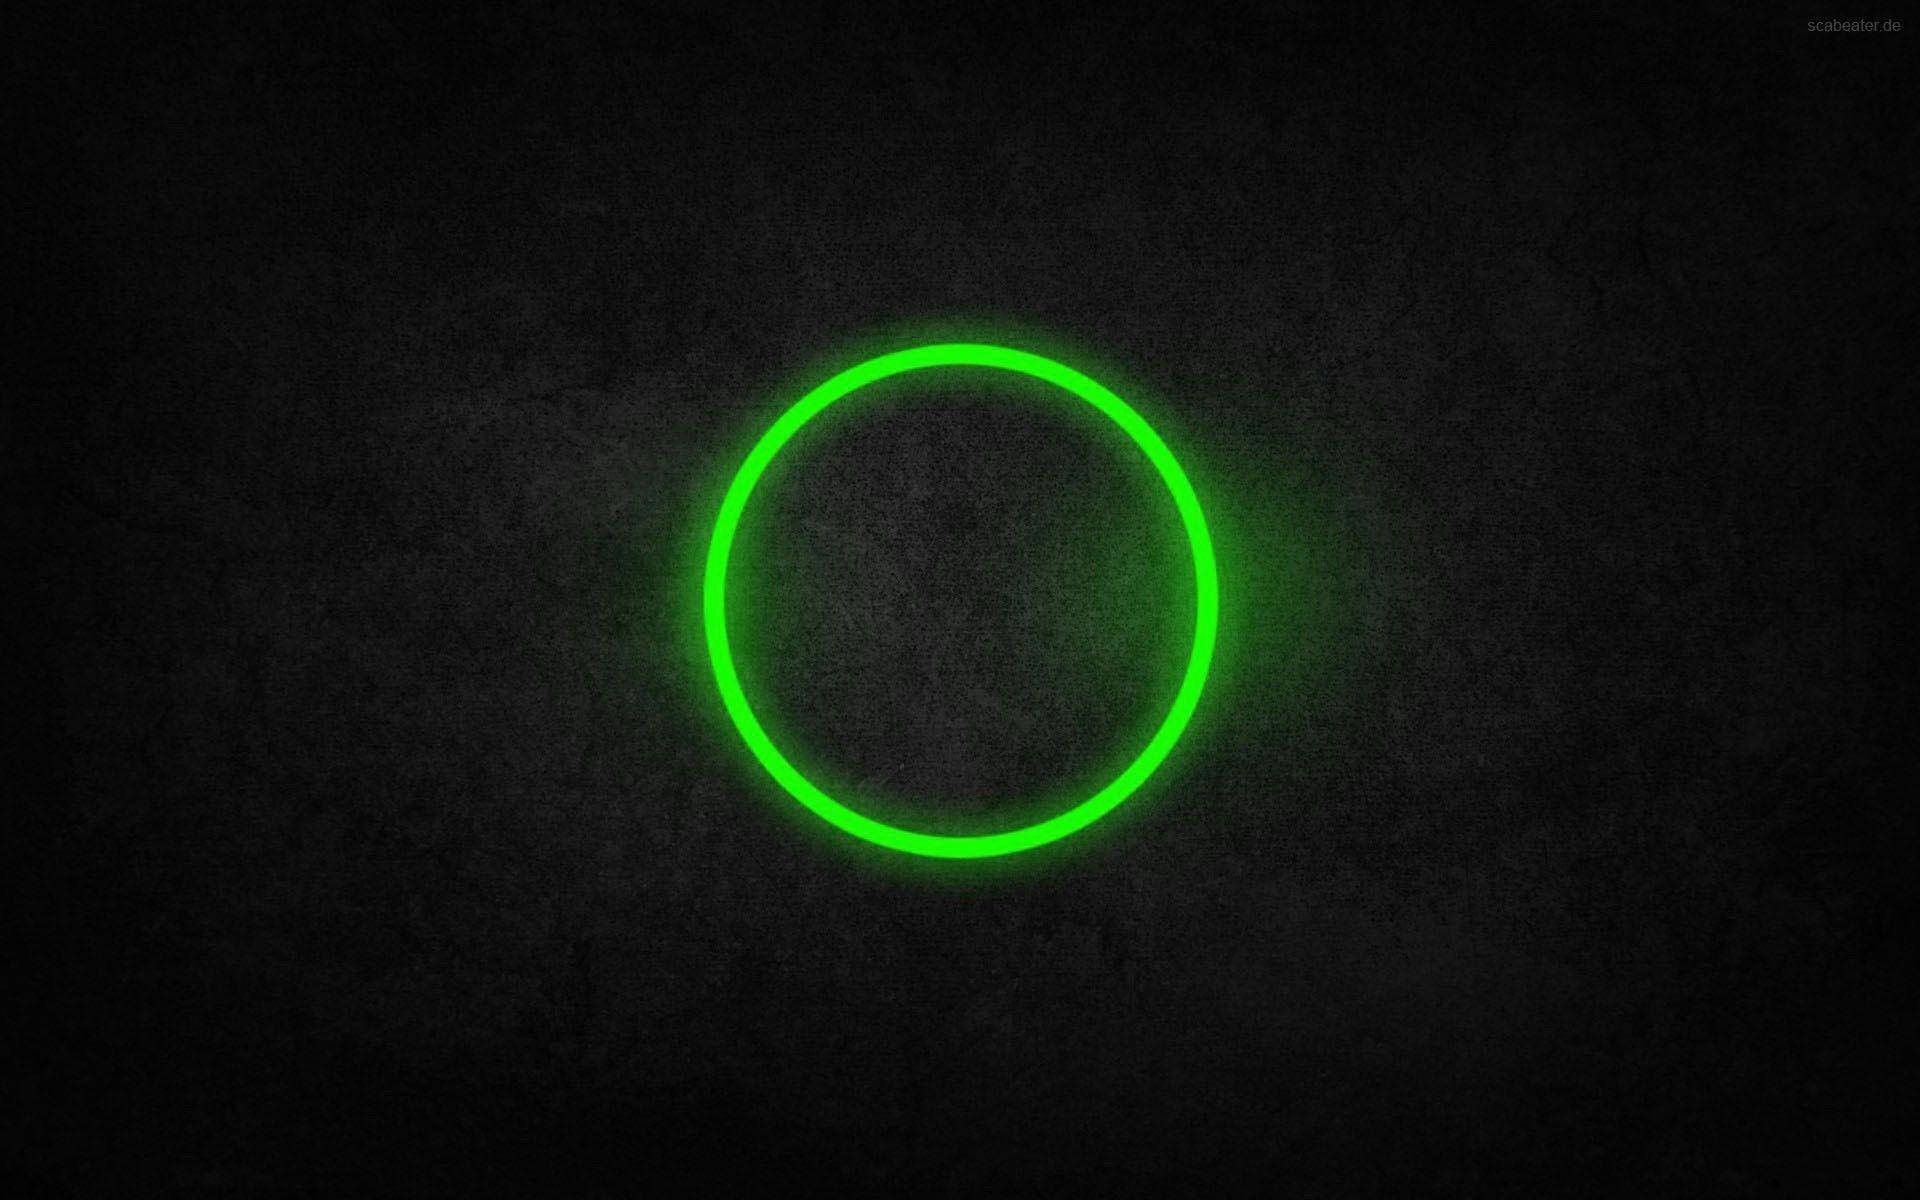 Green Circle Wallpaper No 154906 Dark Black Wallpaper Black Wallpaper Neon Wallpaper